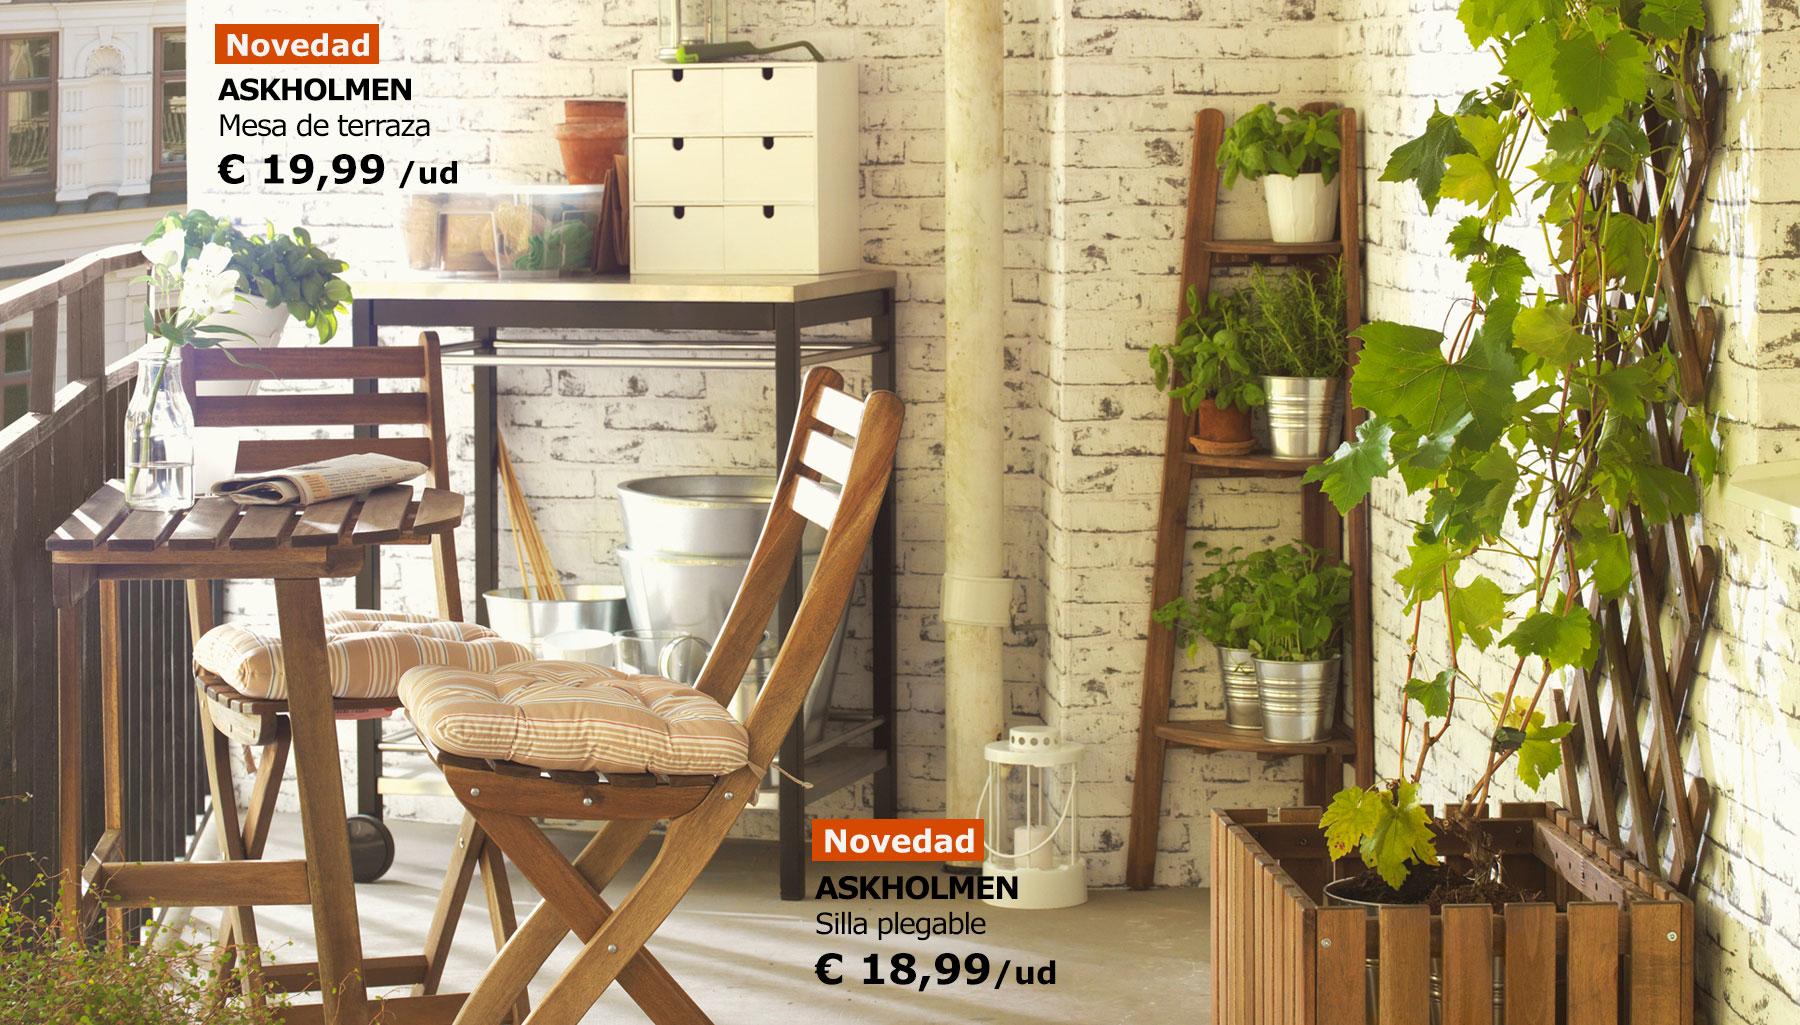 Ejemplos baratos para decorar tu terraza o jard n nova - Capazos baratos para decorar ...